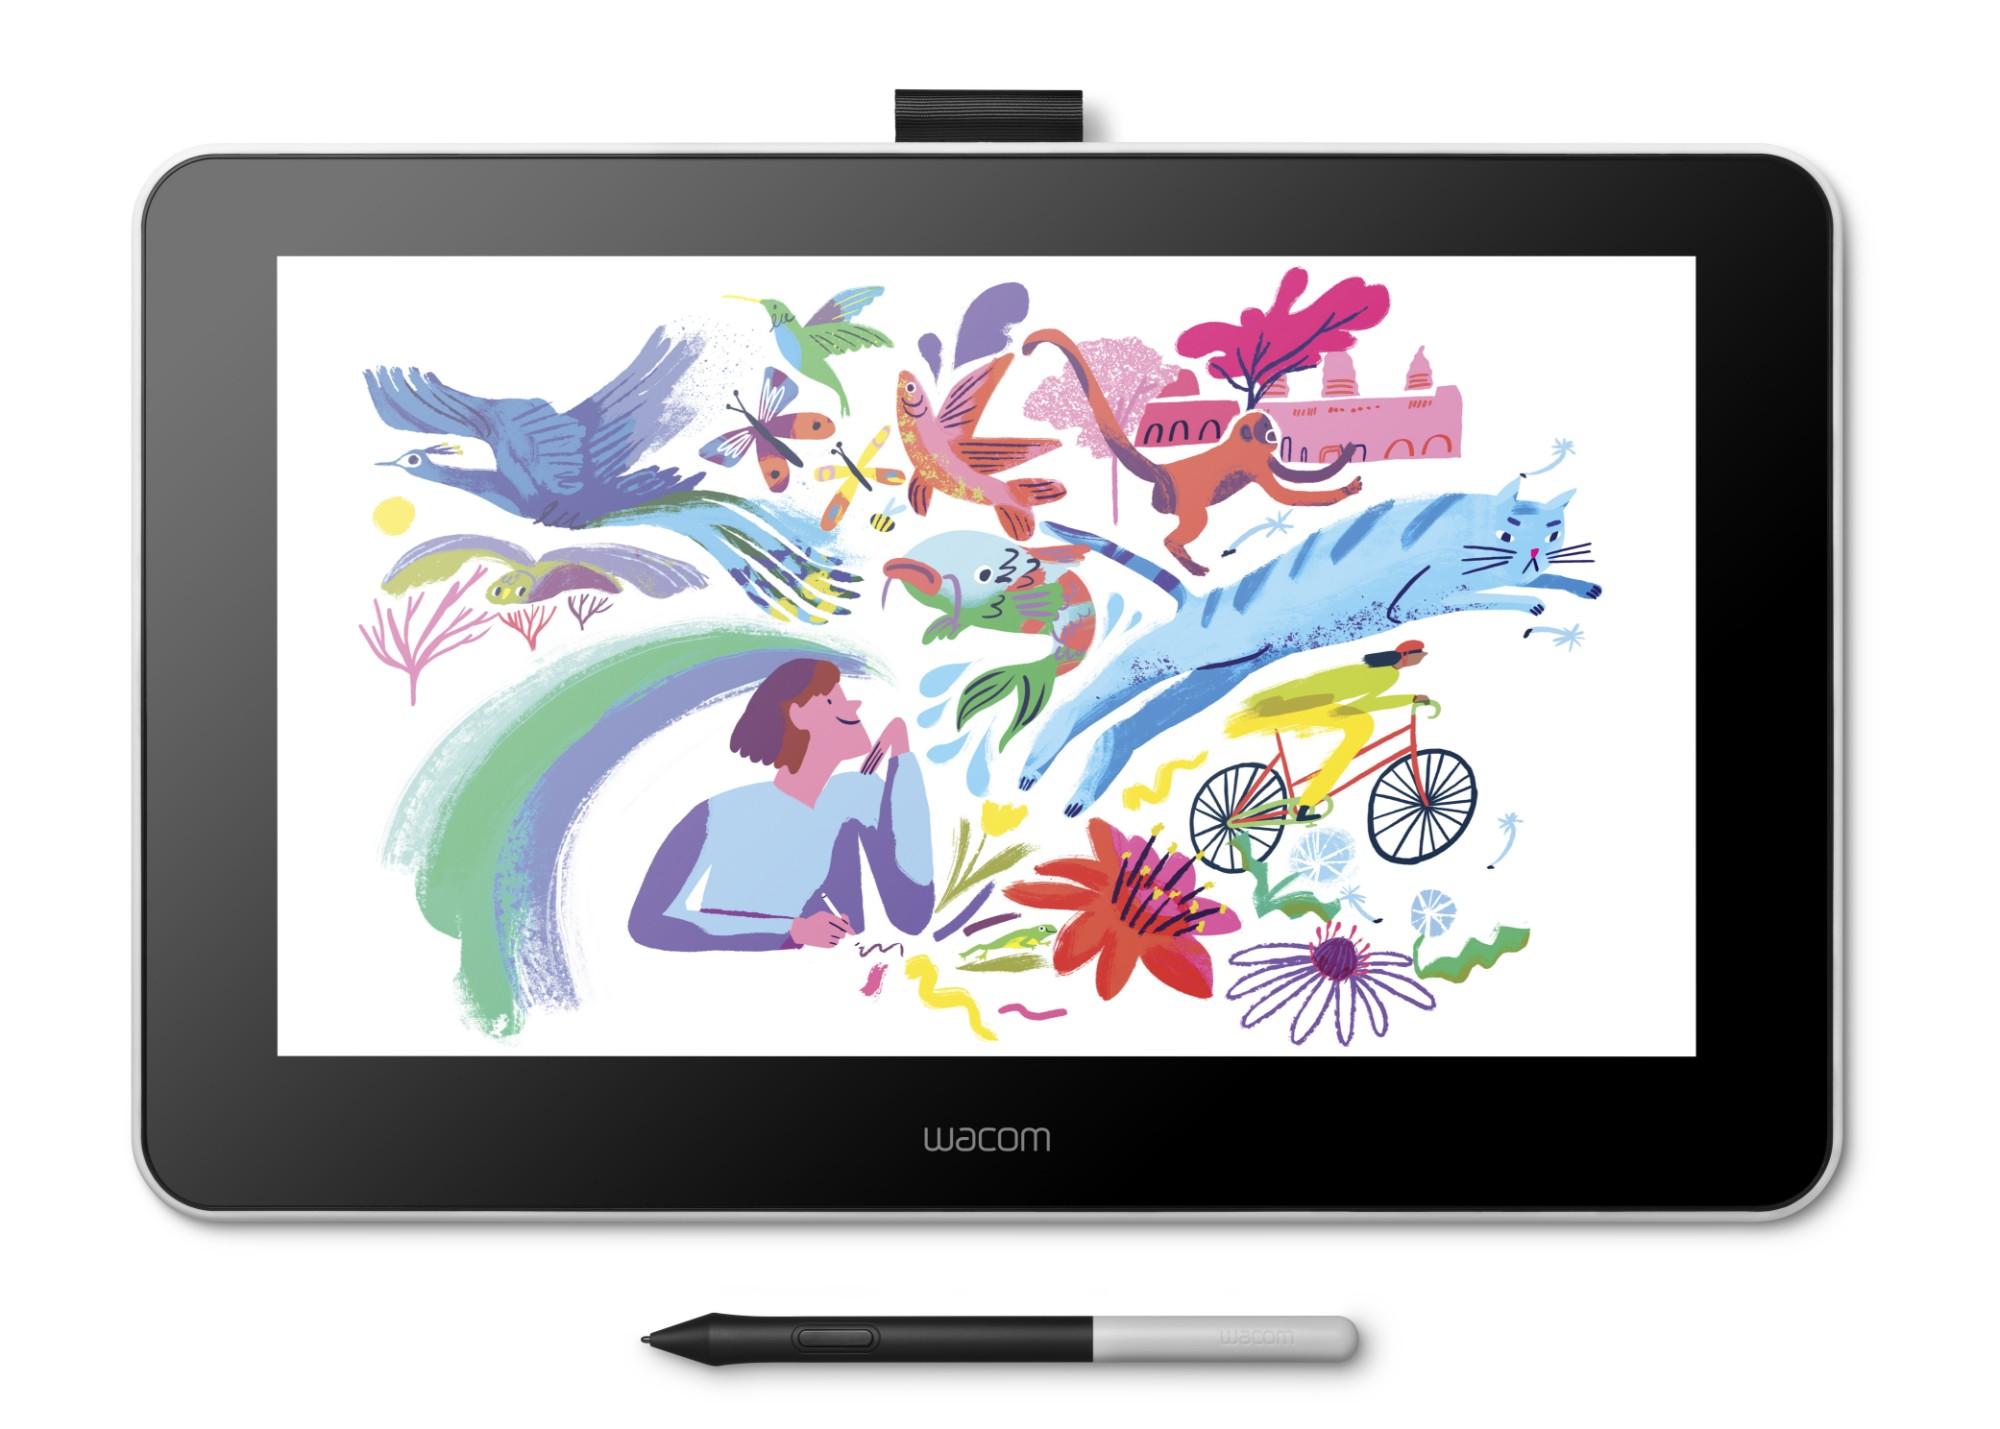 Wacom One 13 graphic tablet 2540 lpi 294 x 166 mm USB White